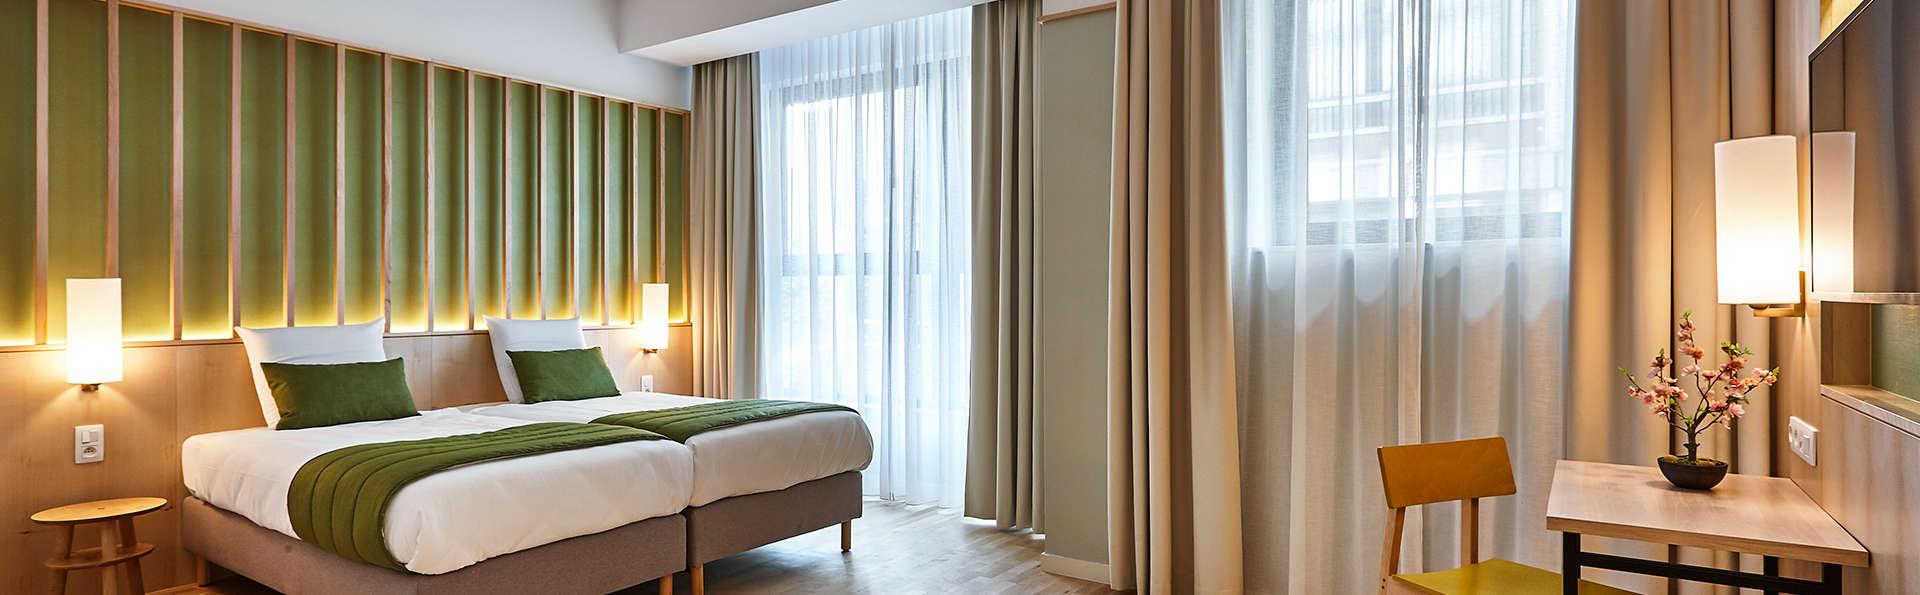 Yadoya Hotel - EDIT_NEW_superior1.jpg